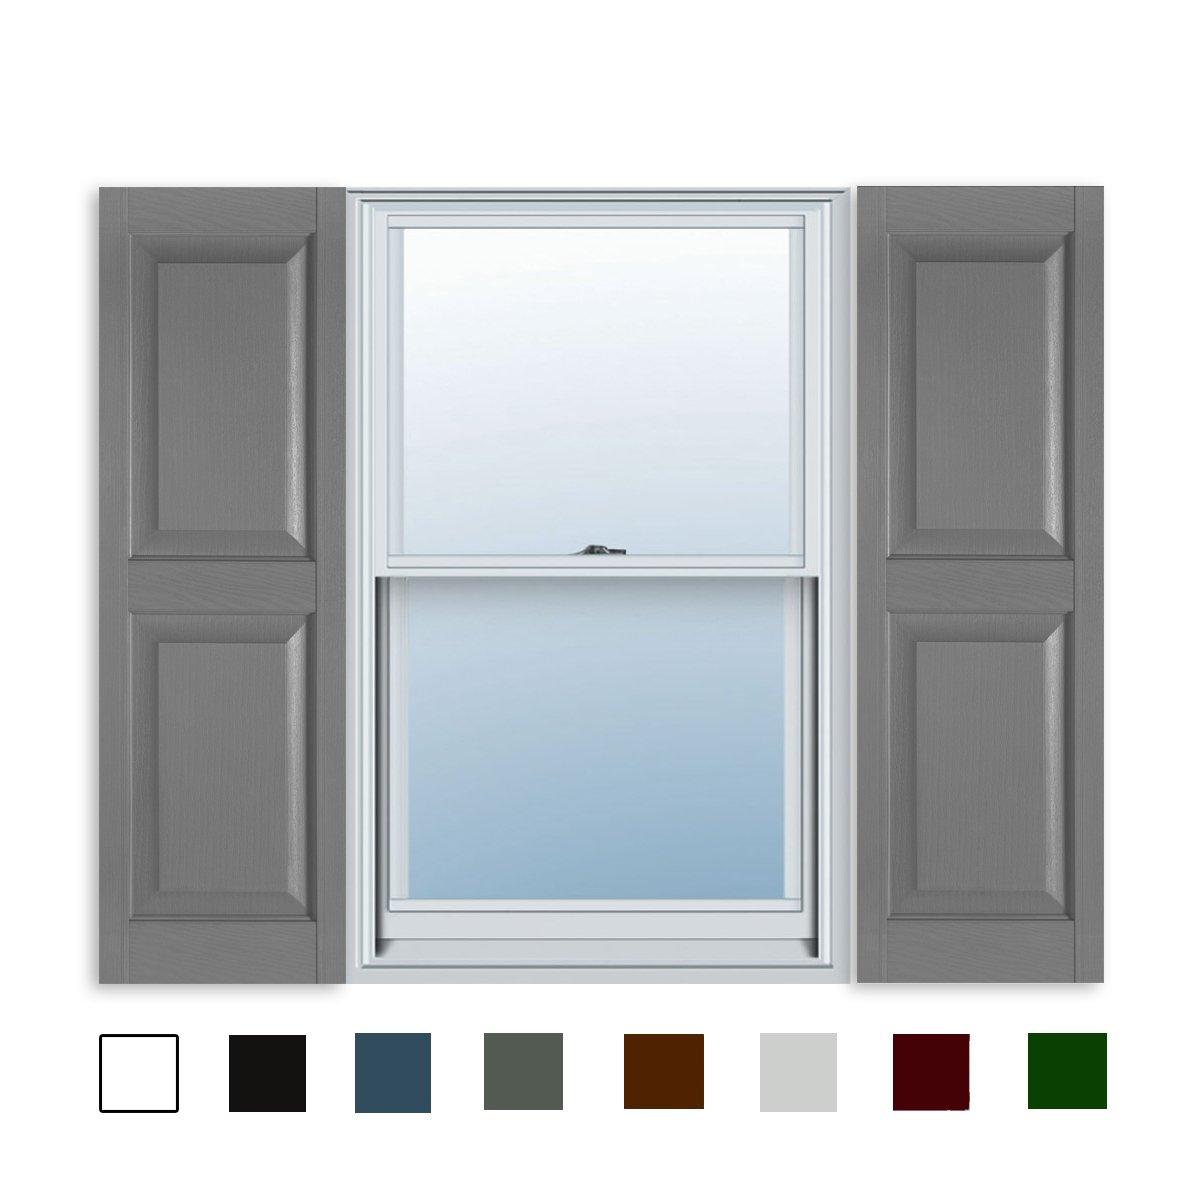 ExteriorSolutions.com 15 Inch x 55 Inch Standard Raised Panel Exterior Vinyl Shutters, Paintable (Pair)